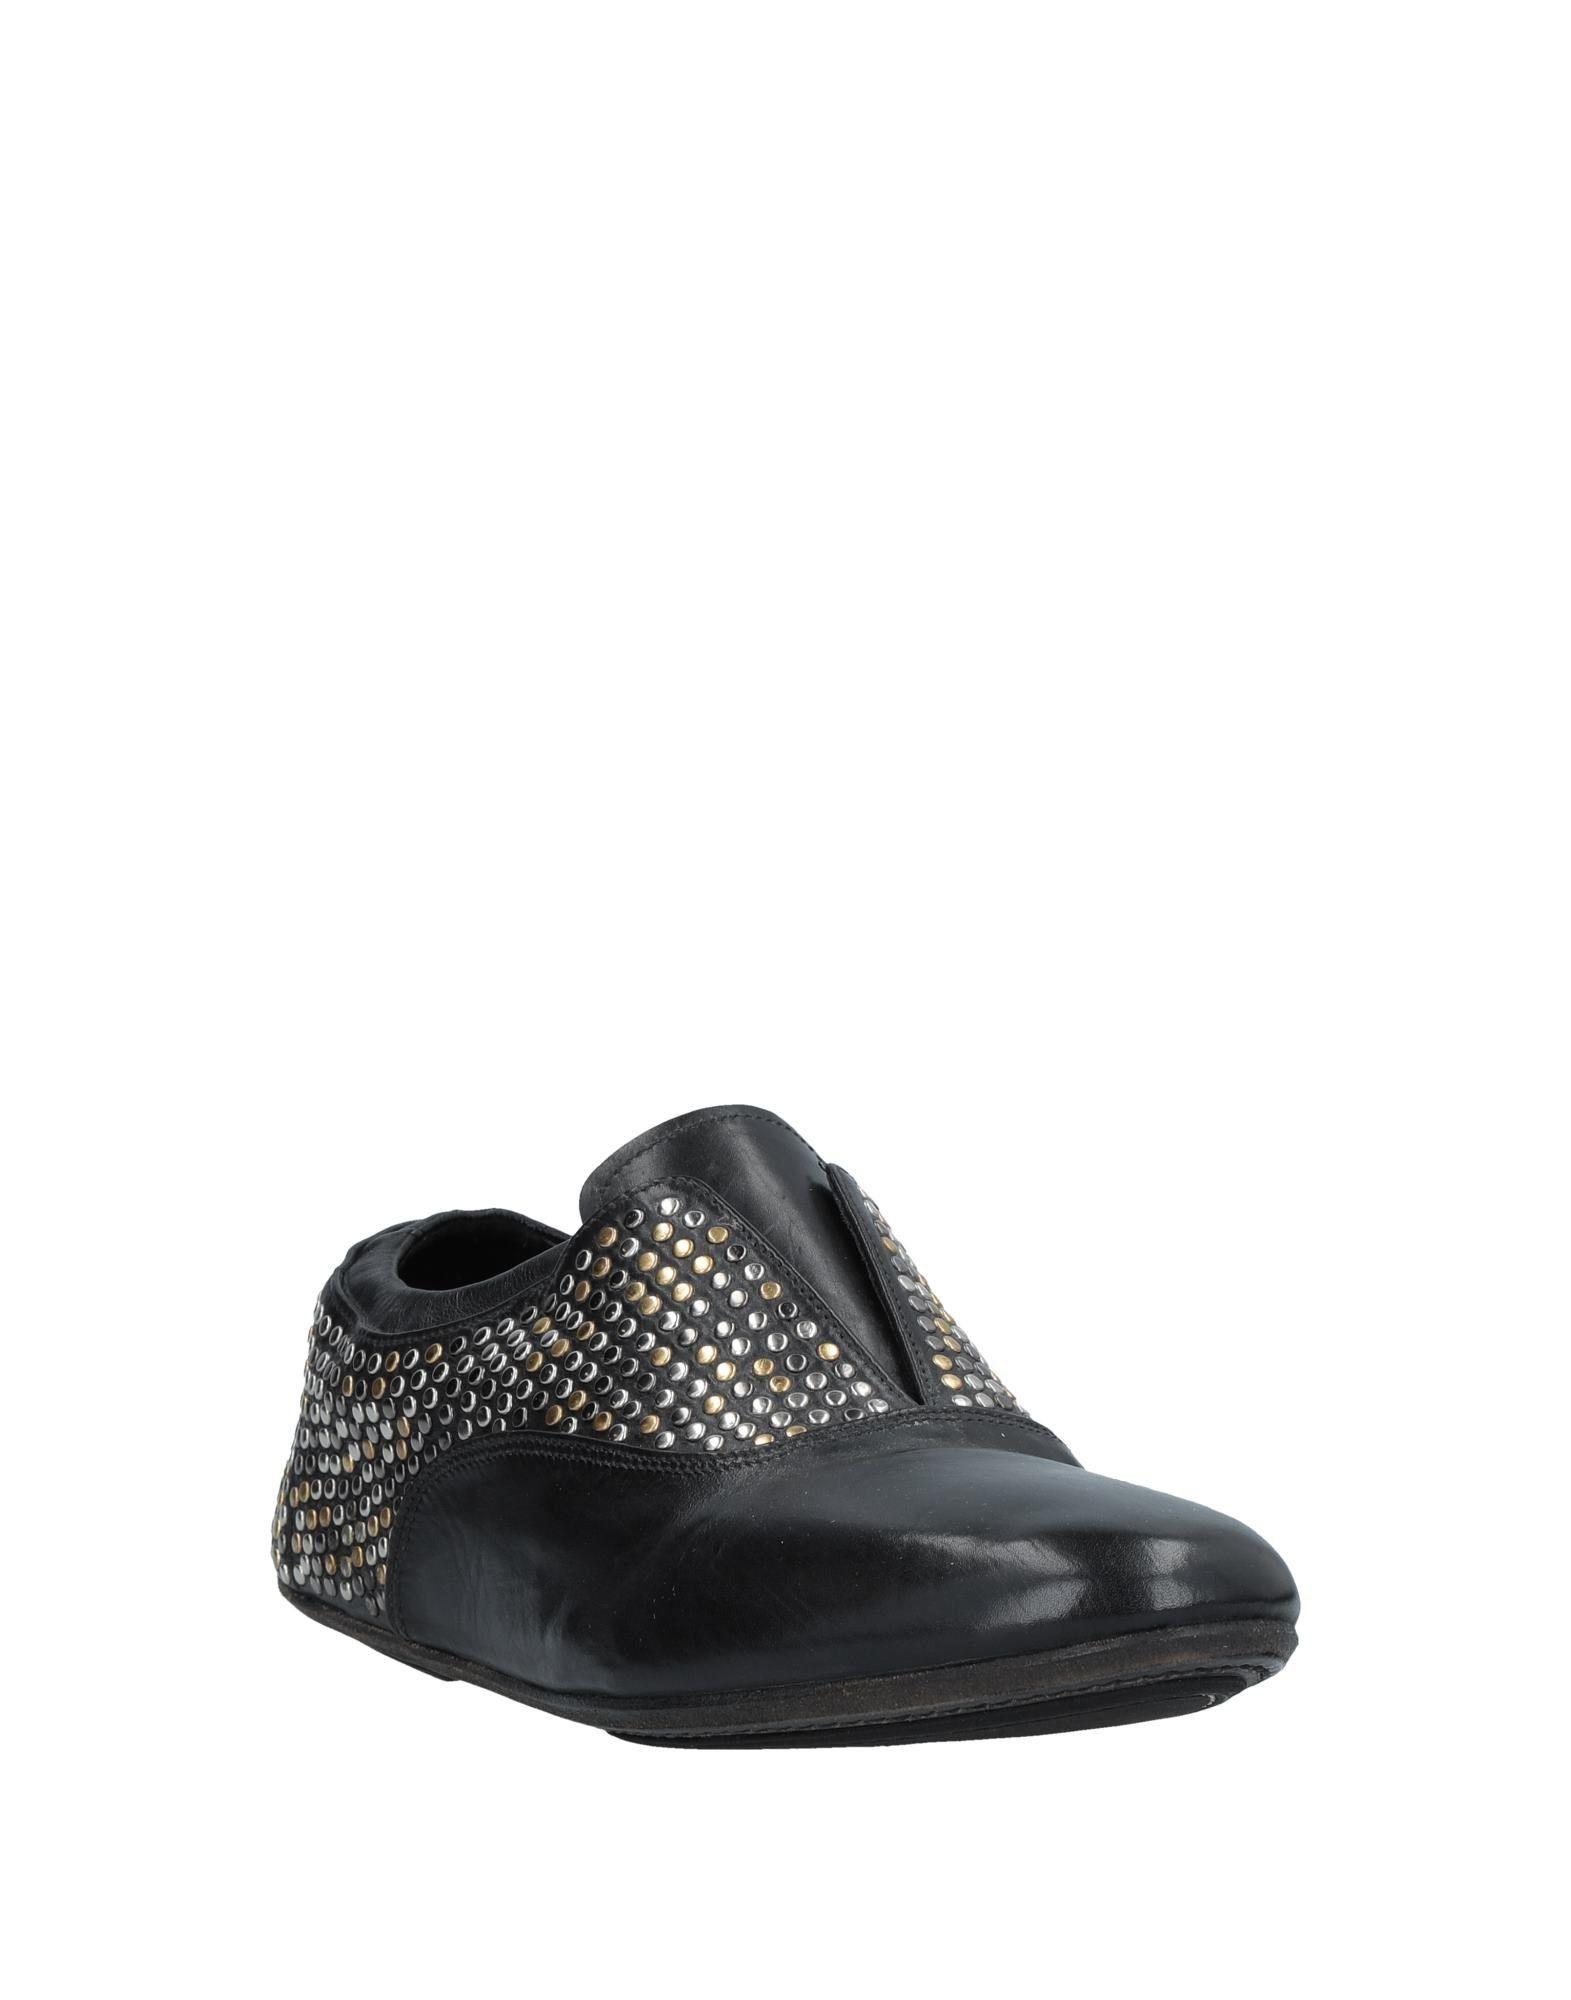 Premiata gut Mokassins Damen  11529600HPGünstige gut Premiata aussehende Schuhe 47eadc